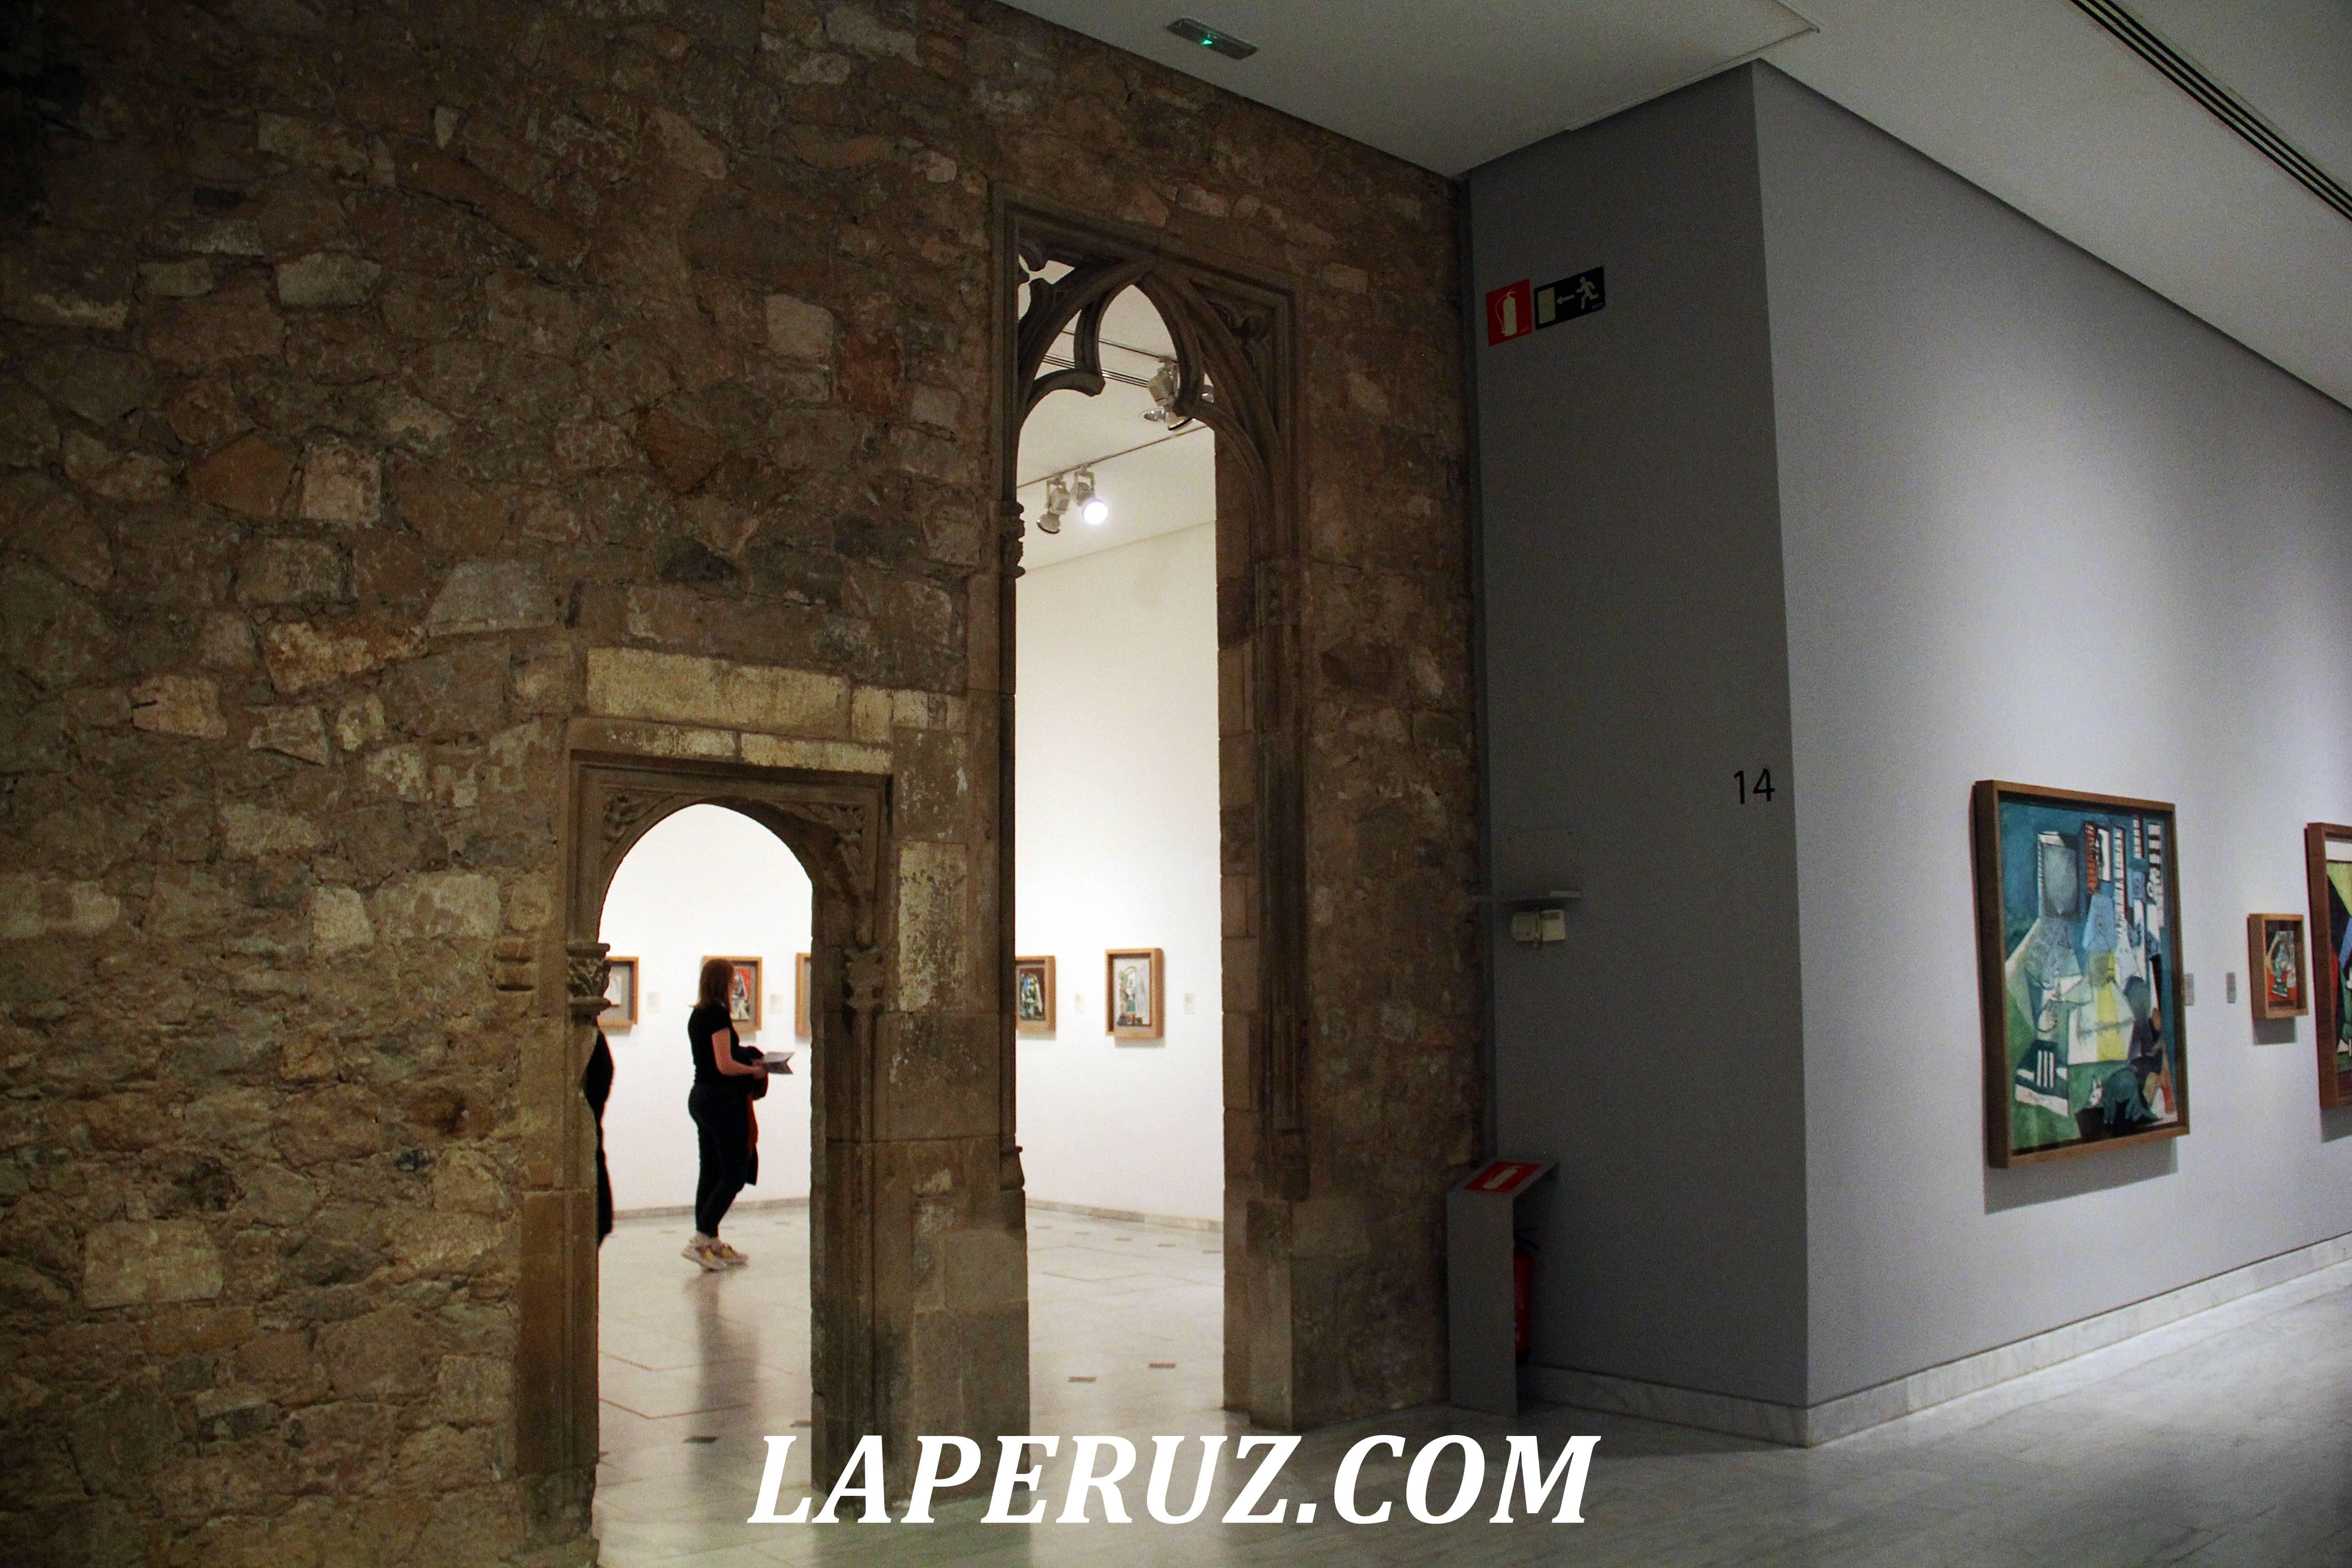 muzei_picasso_barcelona_vnutri_1